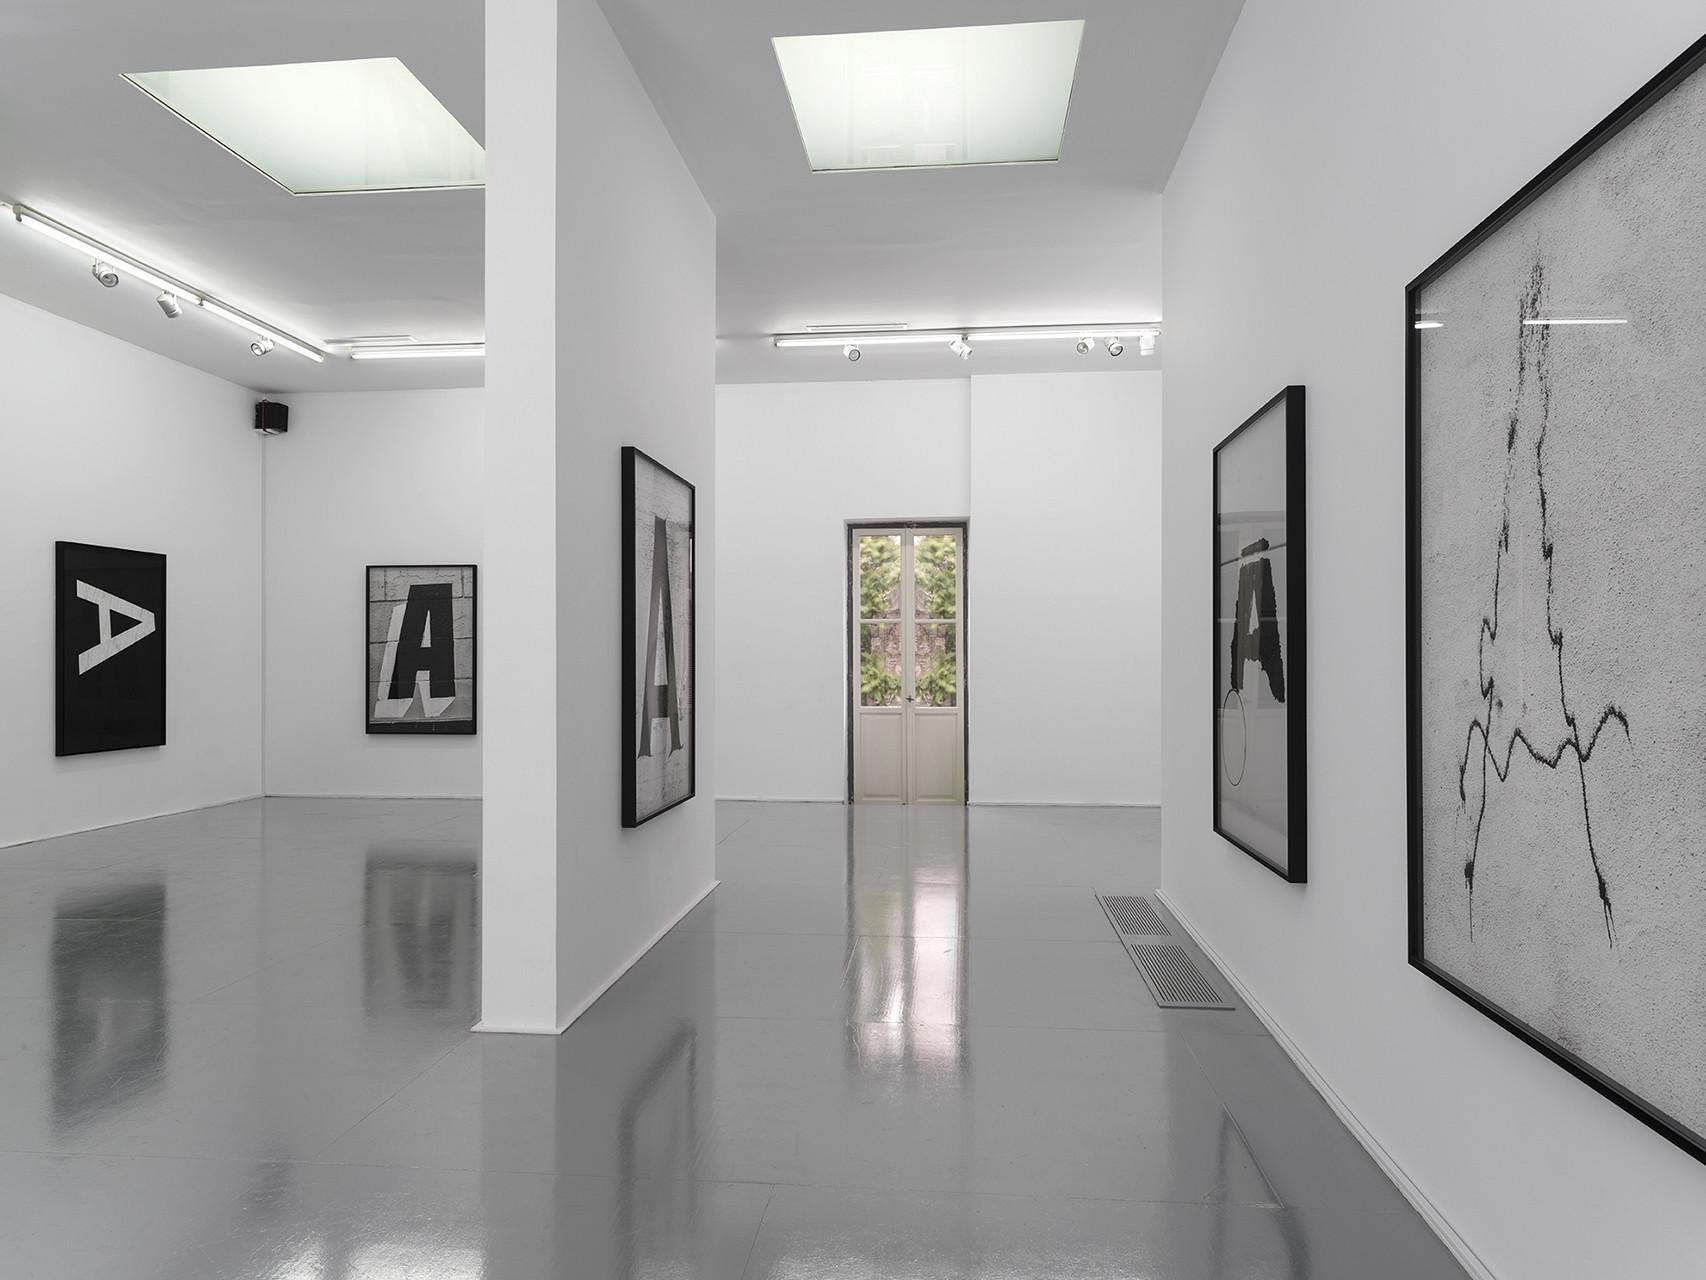 "<div class=""artwork_caption""><p>Installation View, 2017<br>Photo: Boris Kirpotin</p></div>"